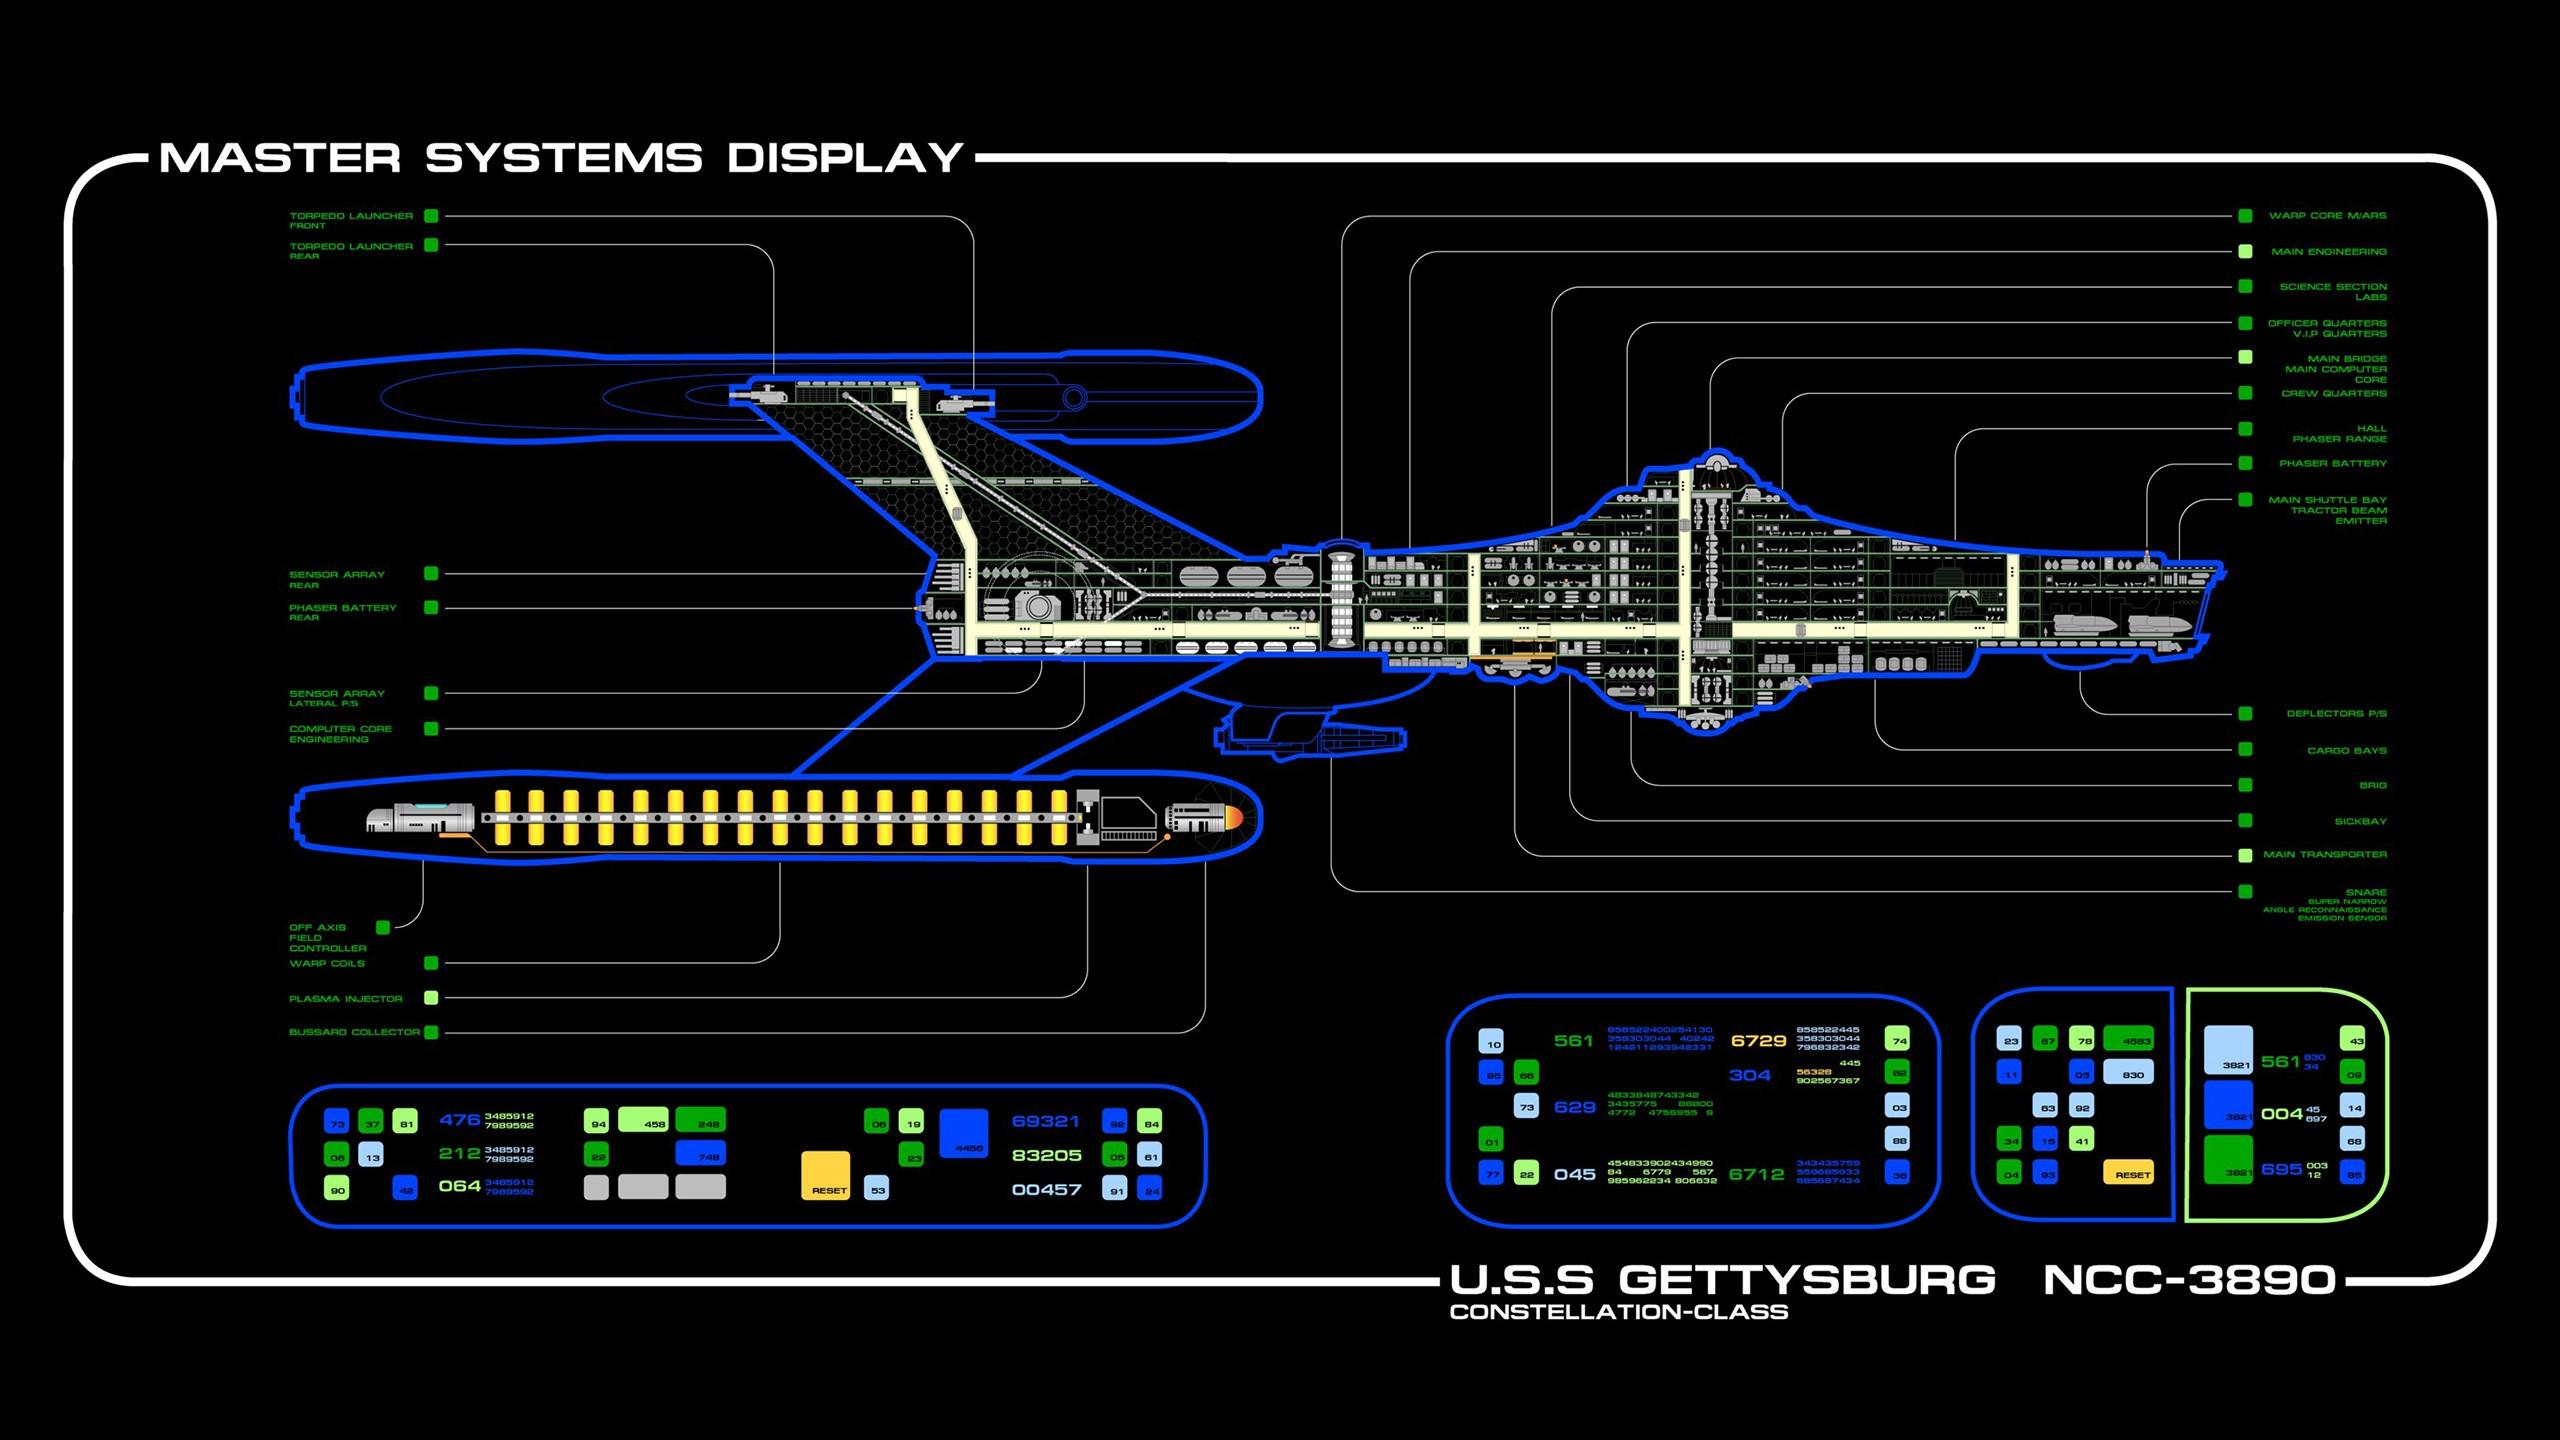 Wallpaper : 2560x1440 px, LCARS, spaceship, Star Trek